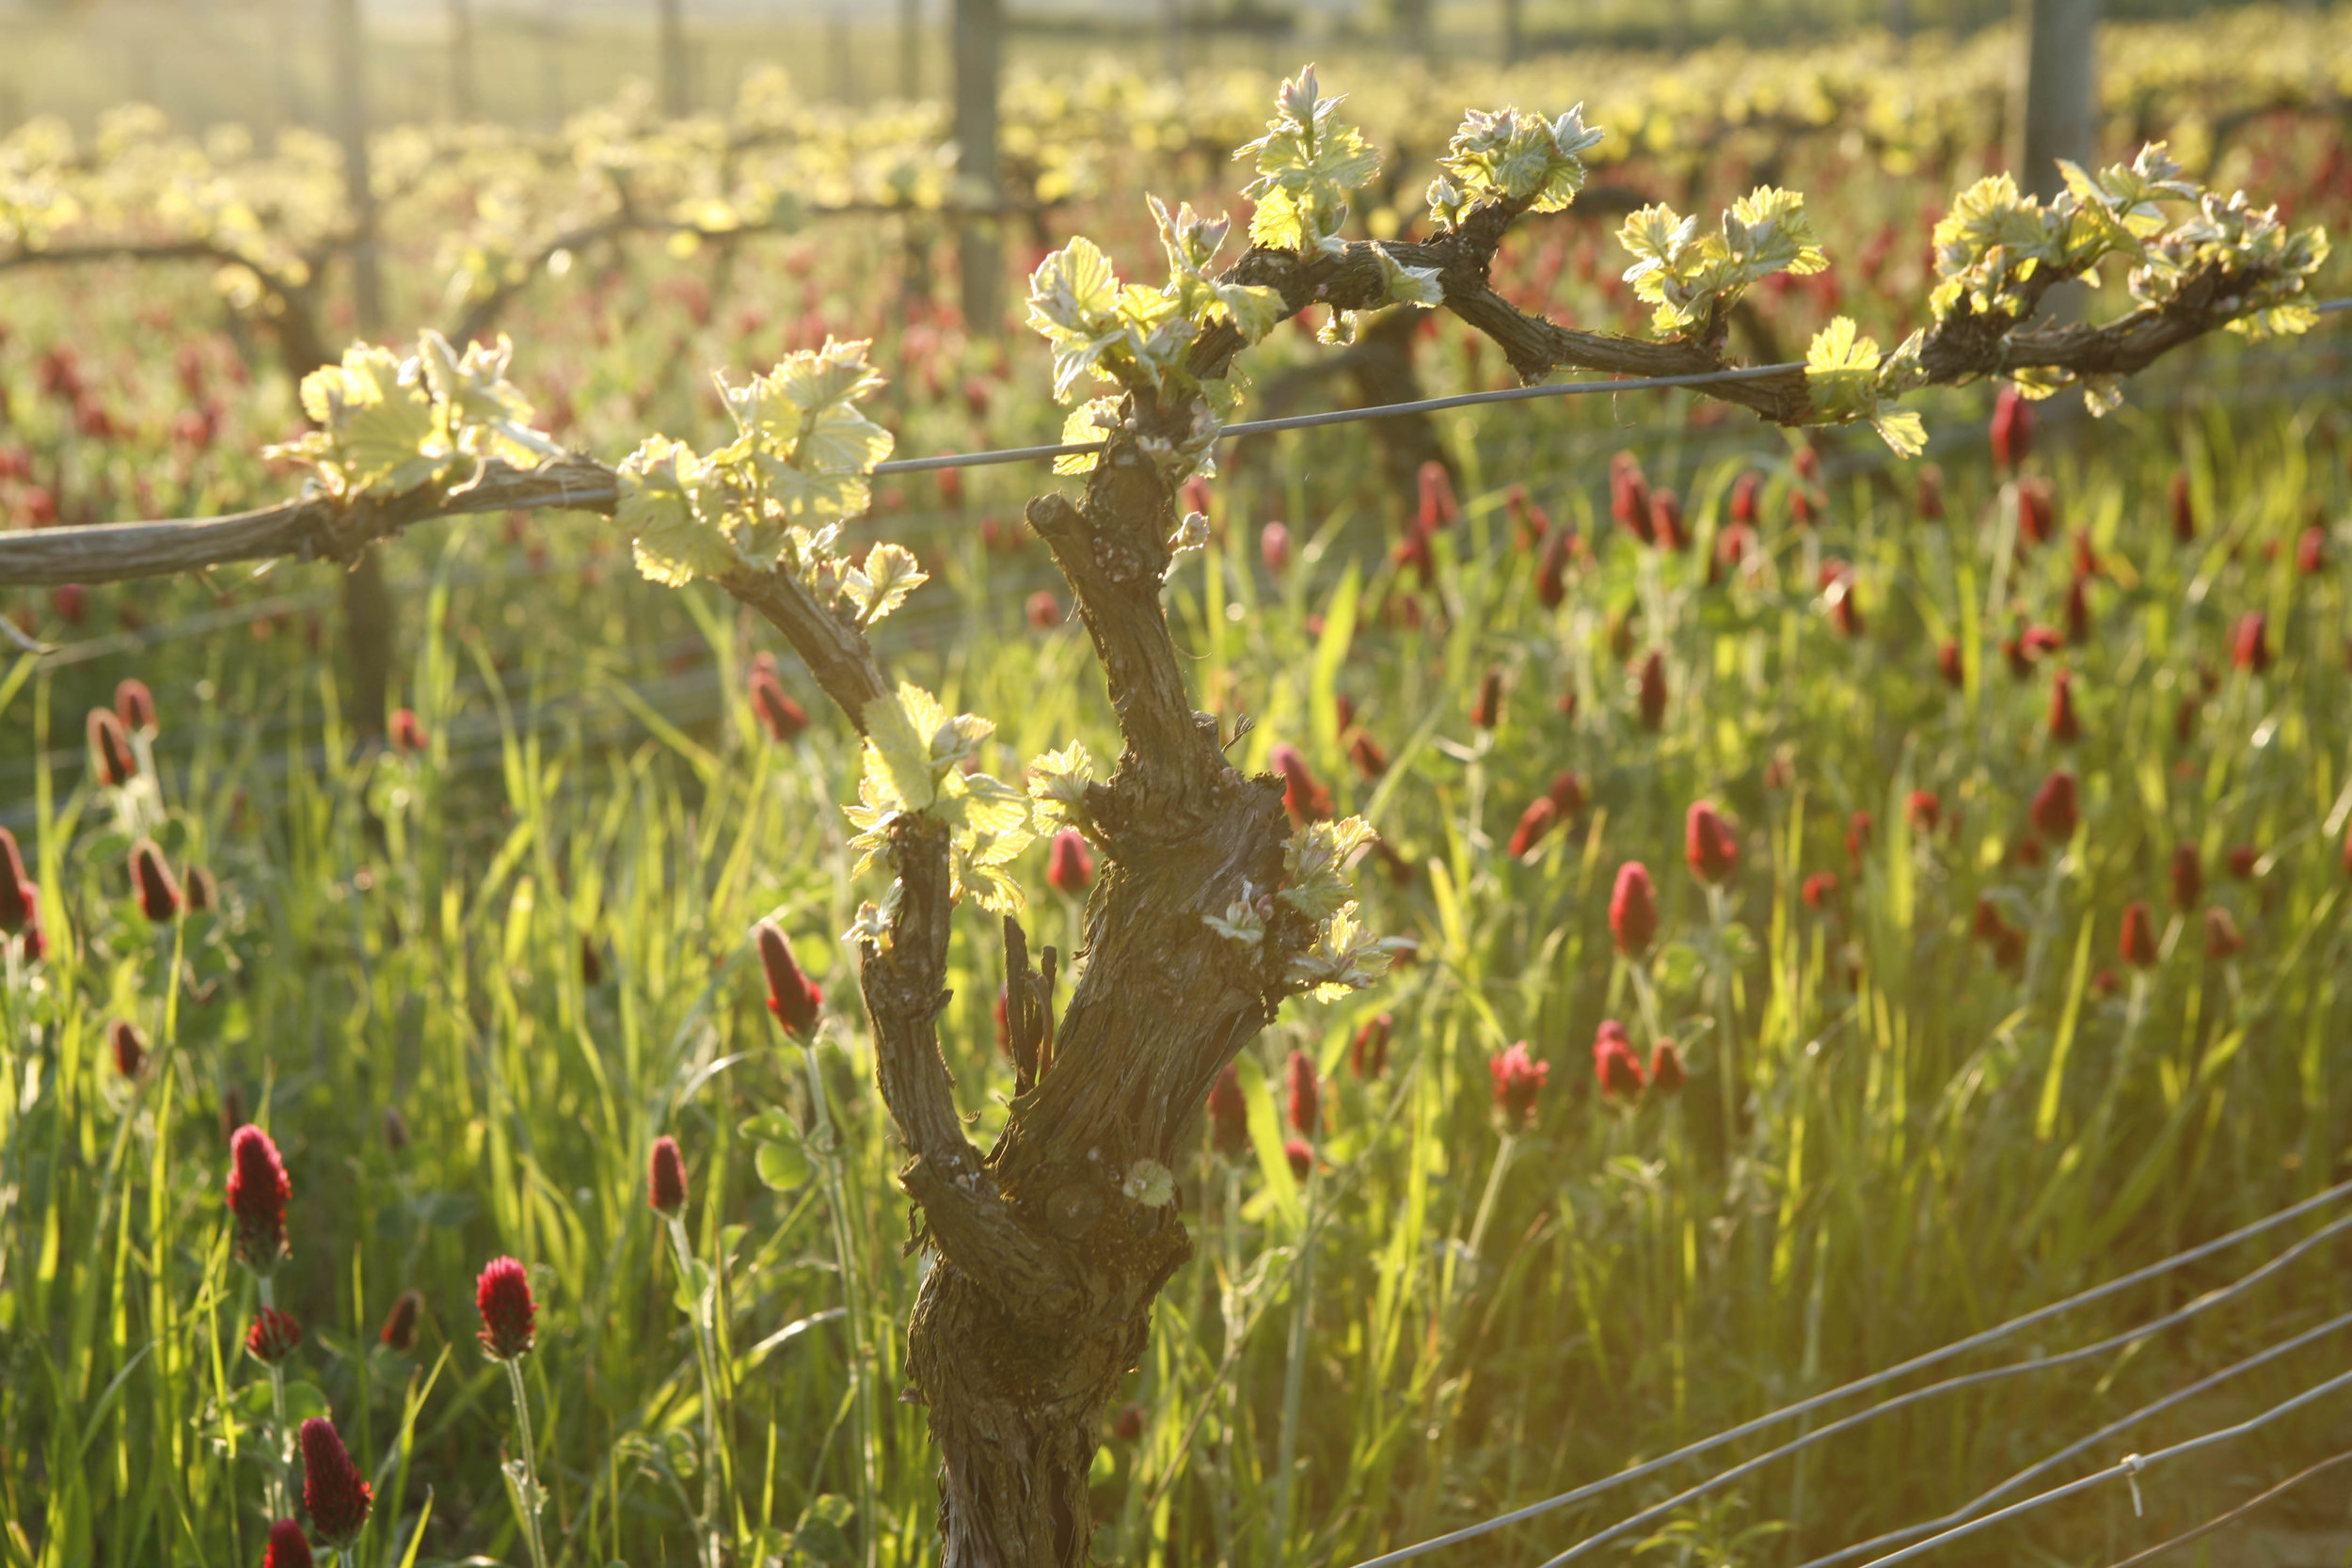 Sunlit Flowers at Adelsheim Vineyard